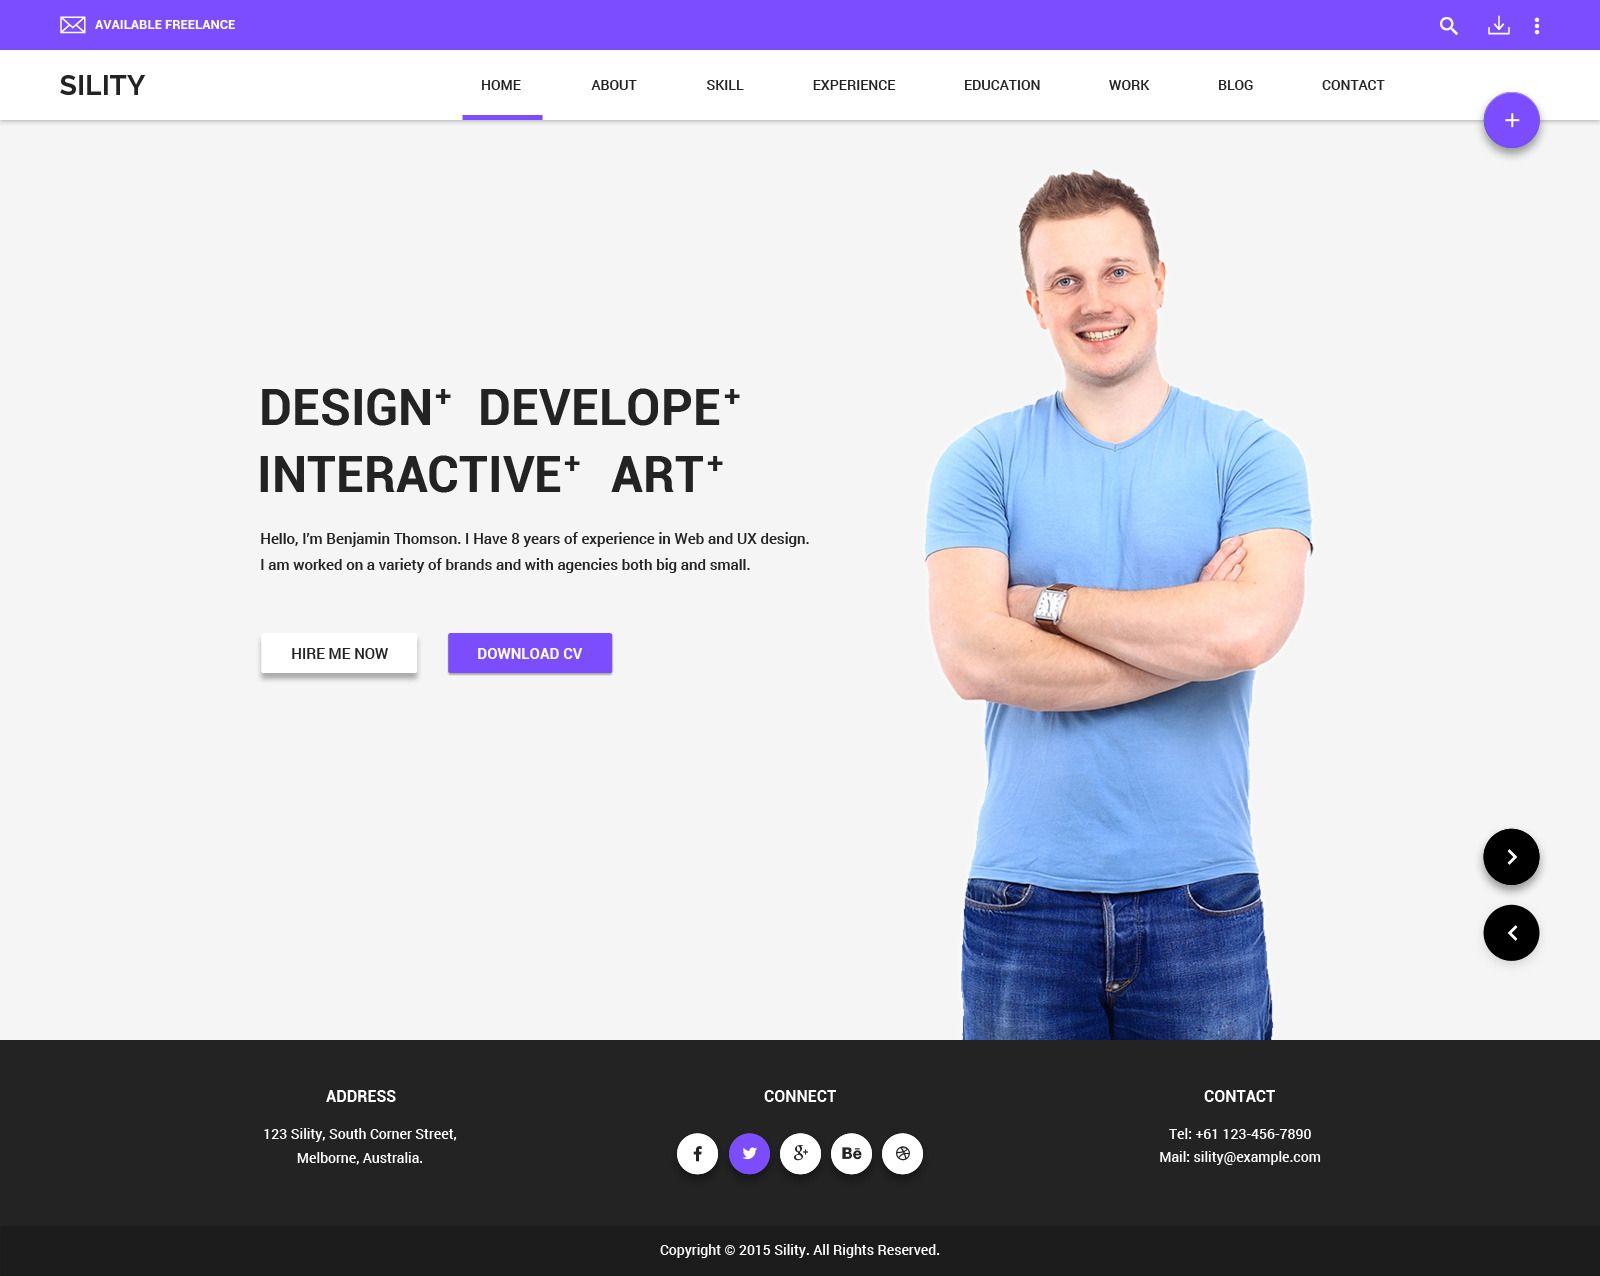 Sility Material Design Vcard Cv Psd Template Wordpress Theme Wordpress Theme Responsive Personal Website Templates